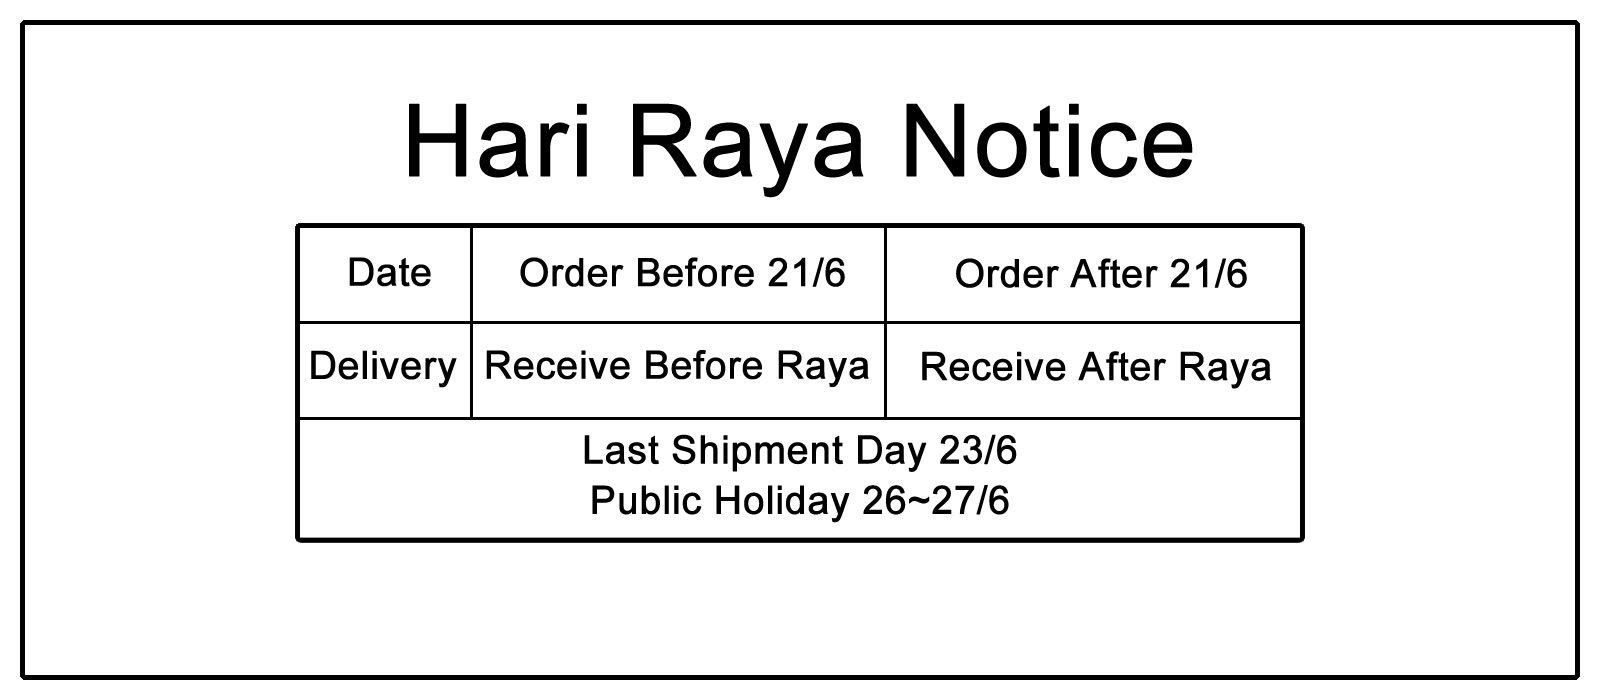 Hari Raya Notice